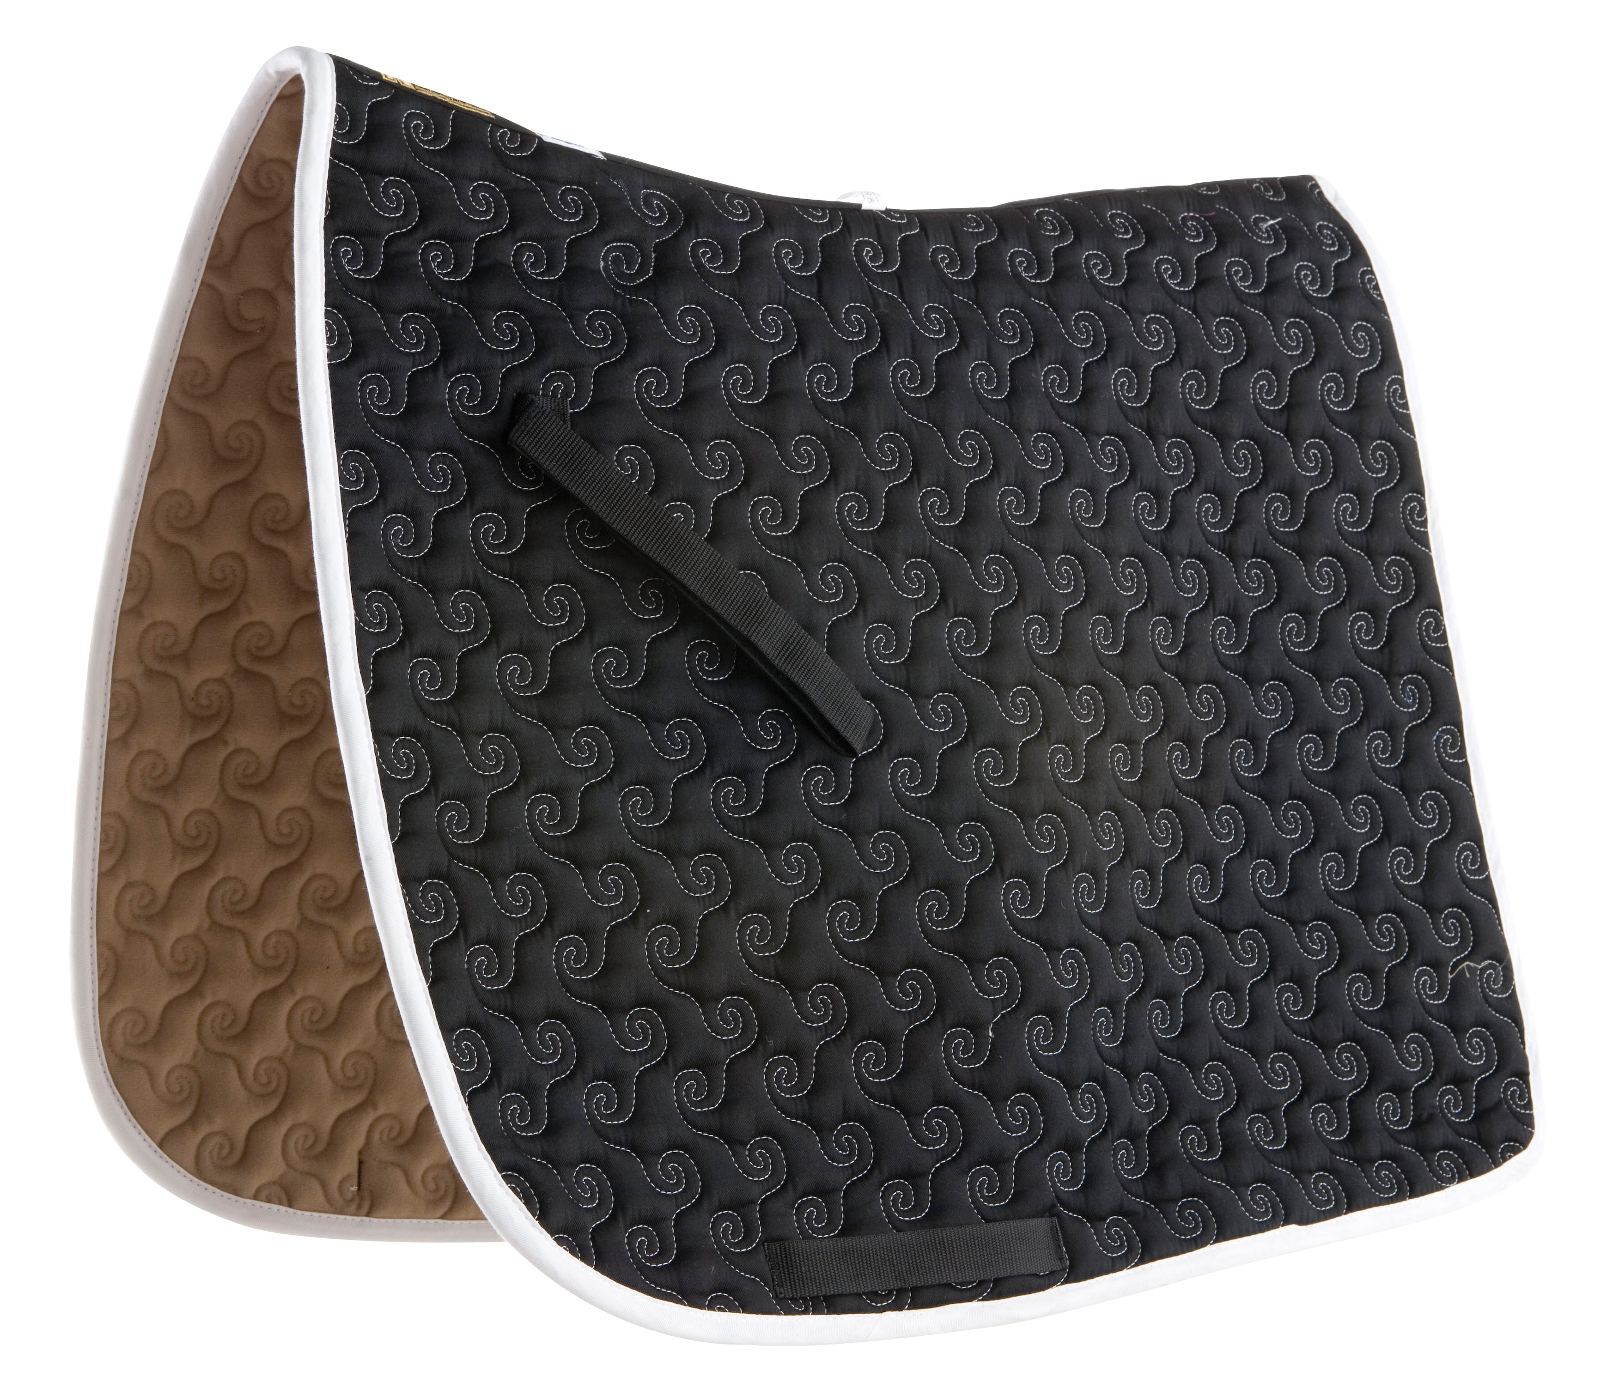 Roma Ecole Contrast Stitch Swirl Quilt Saddle Pad